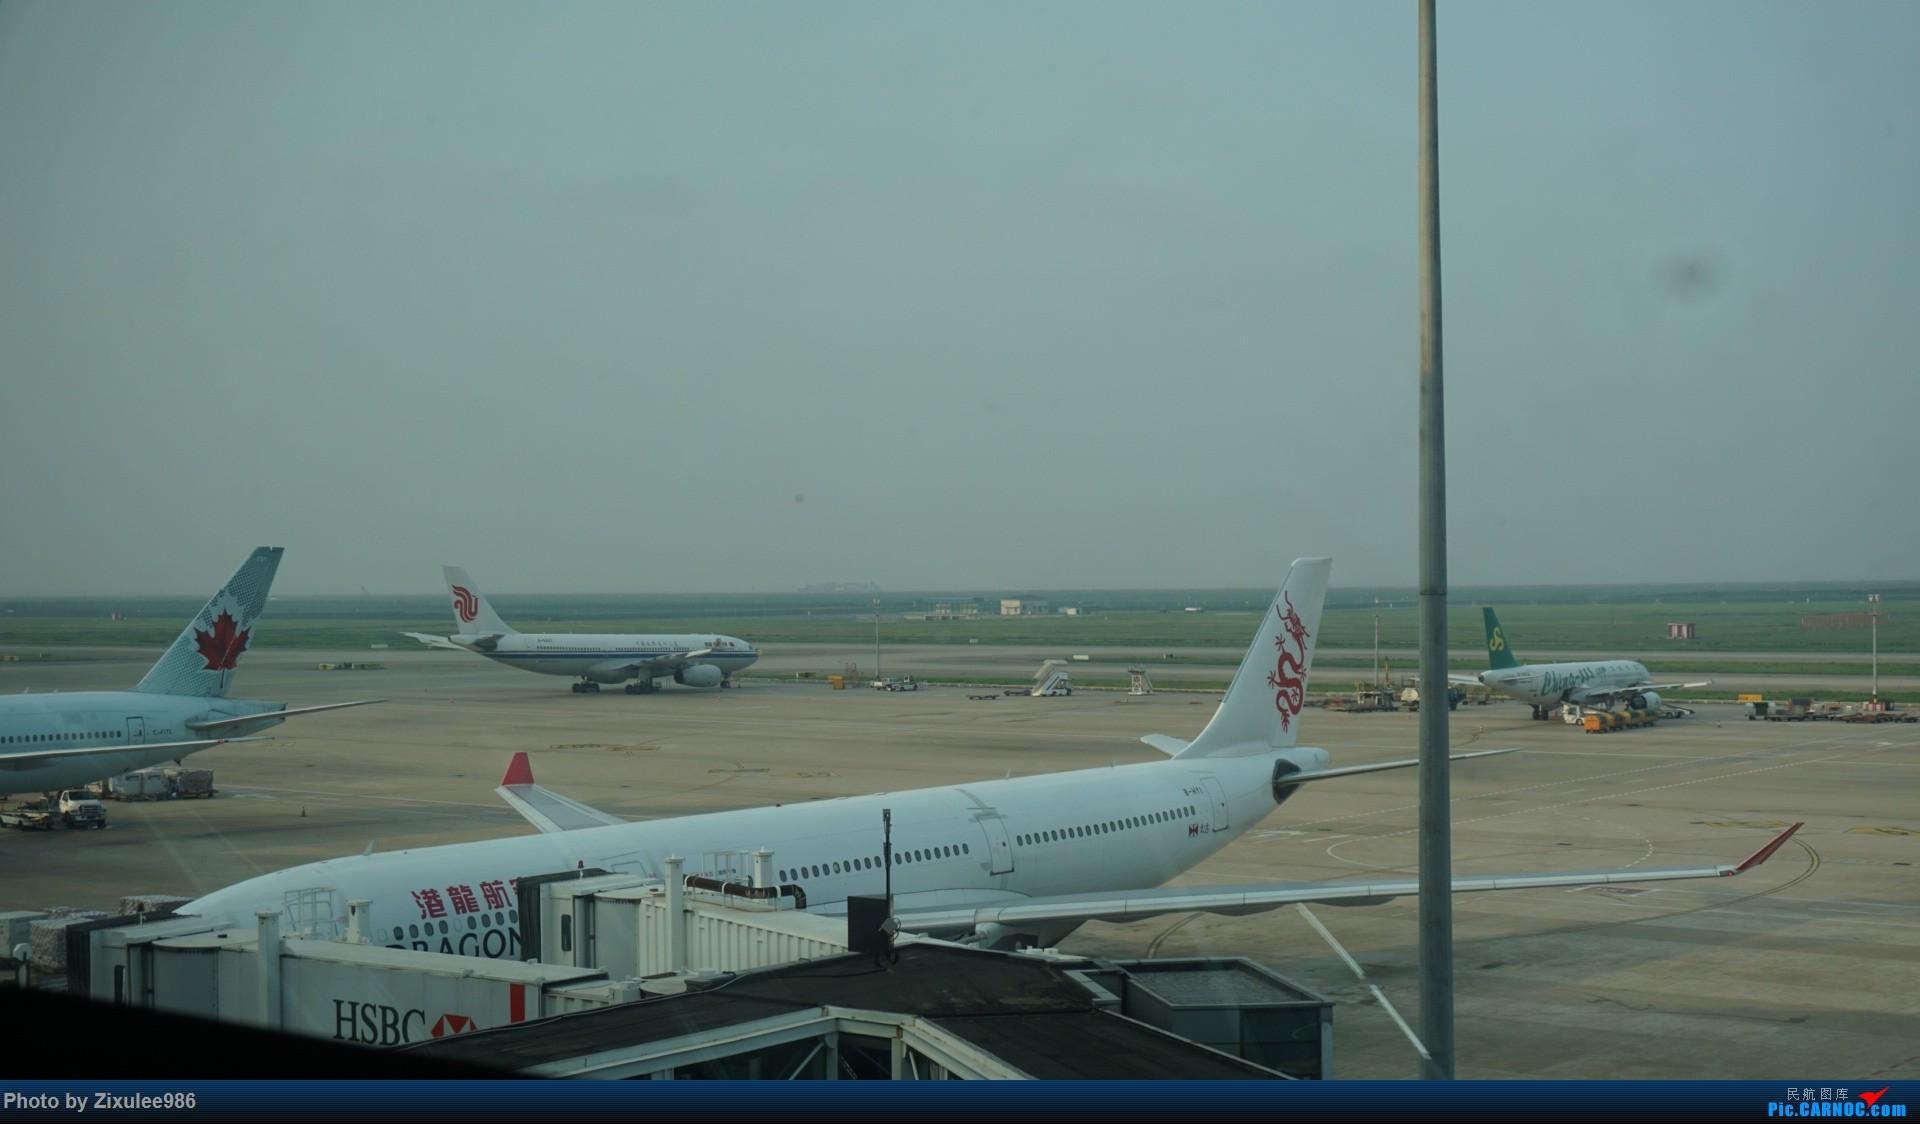 Re:[原创]加拿大21日游学之旅 (二)~加航AC28..PVG-YYZ到达多村后的雨天~多图缓更,请各位大侠谅解~ AIRBUS A330-300 B-HYI 中国上海浦东国际机场